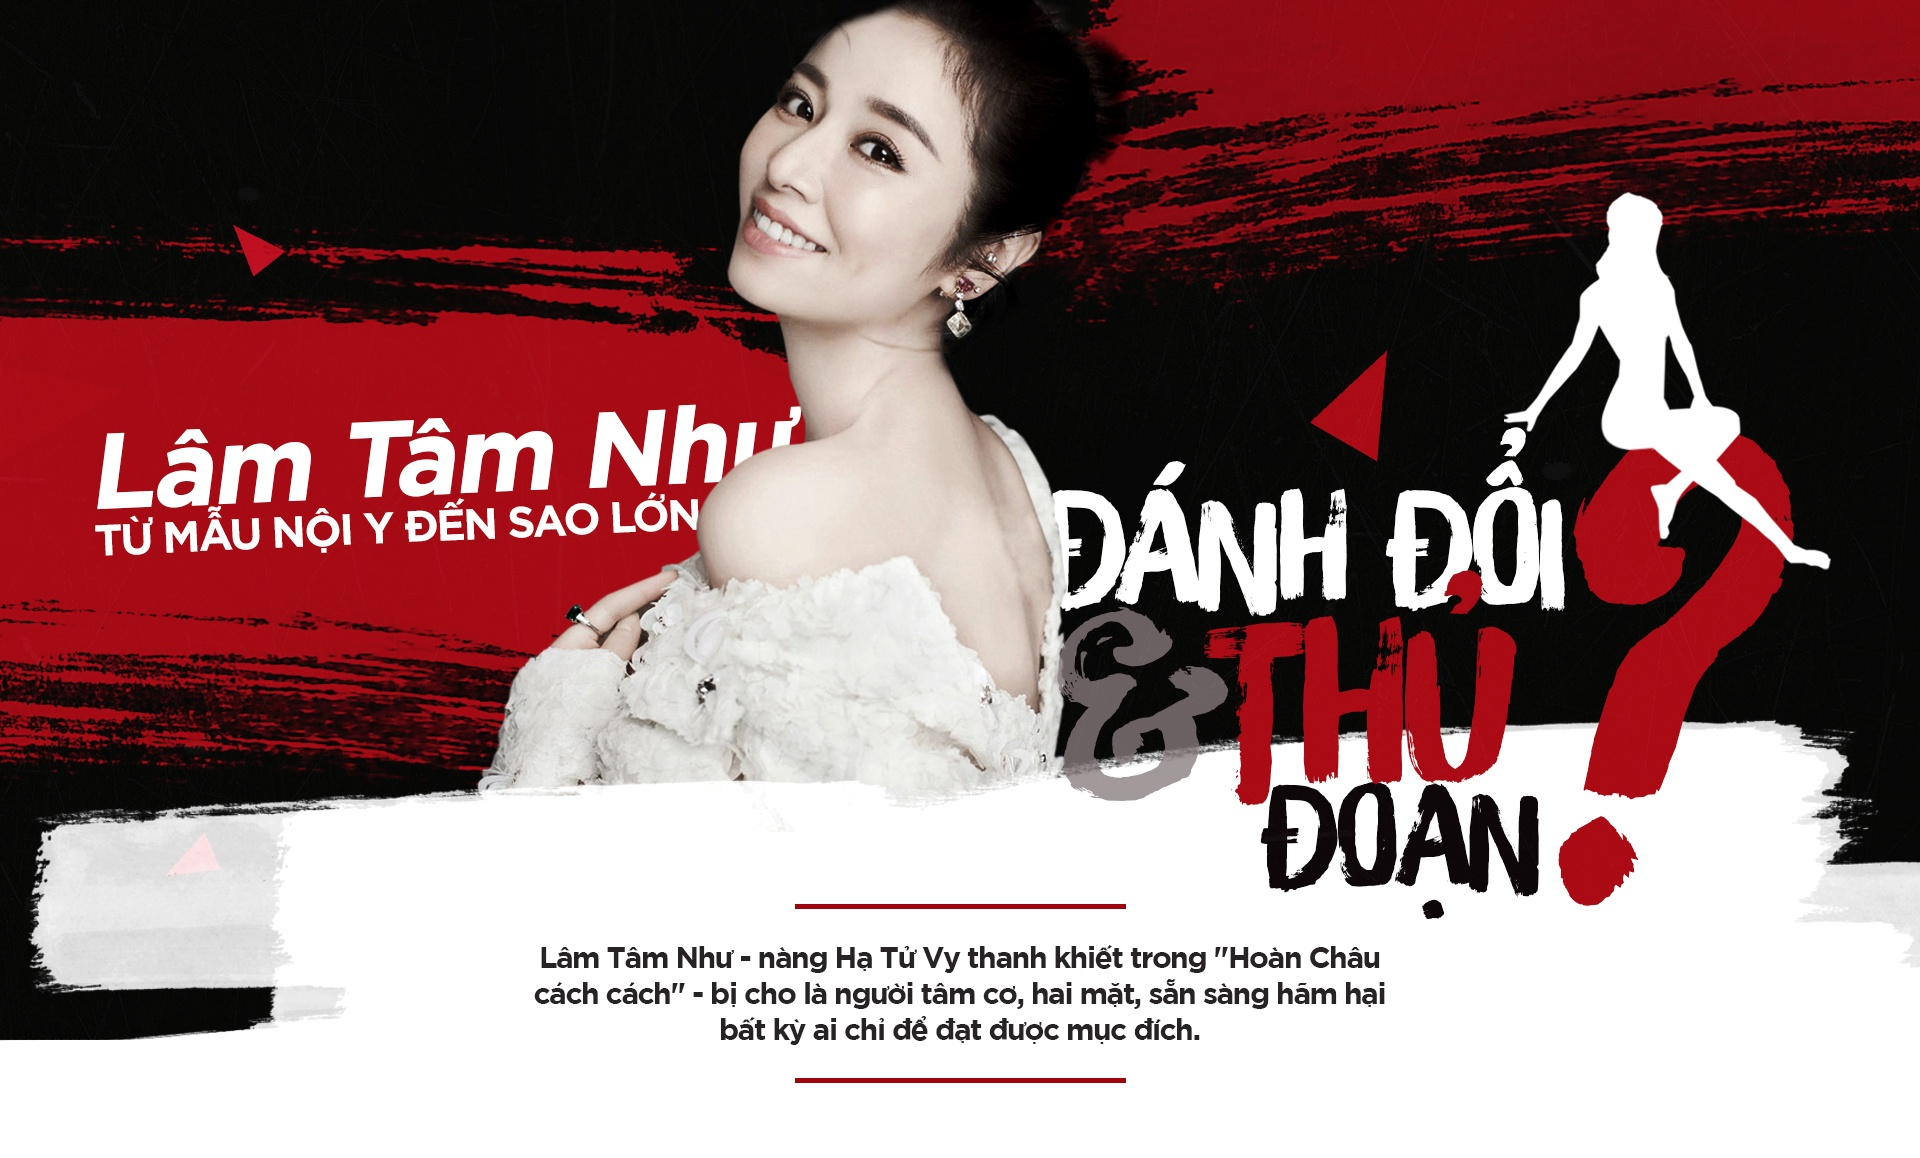 Lam Tam Nhu tu mau noi y den sao lon: Danh doi va thu doan? hinh anh 2